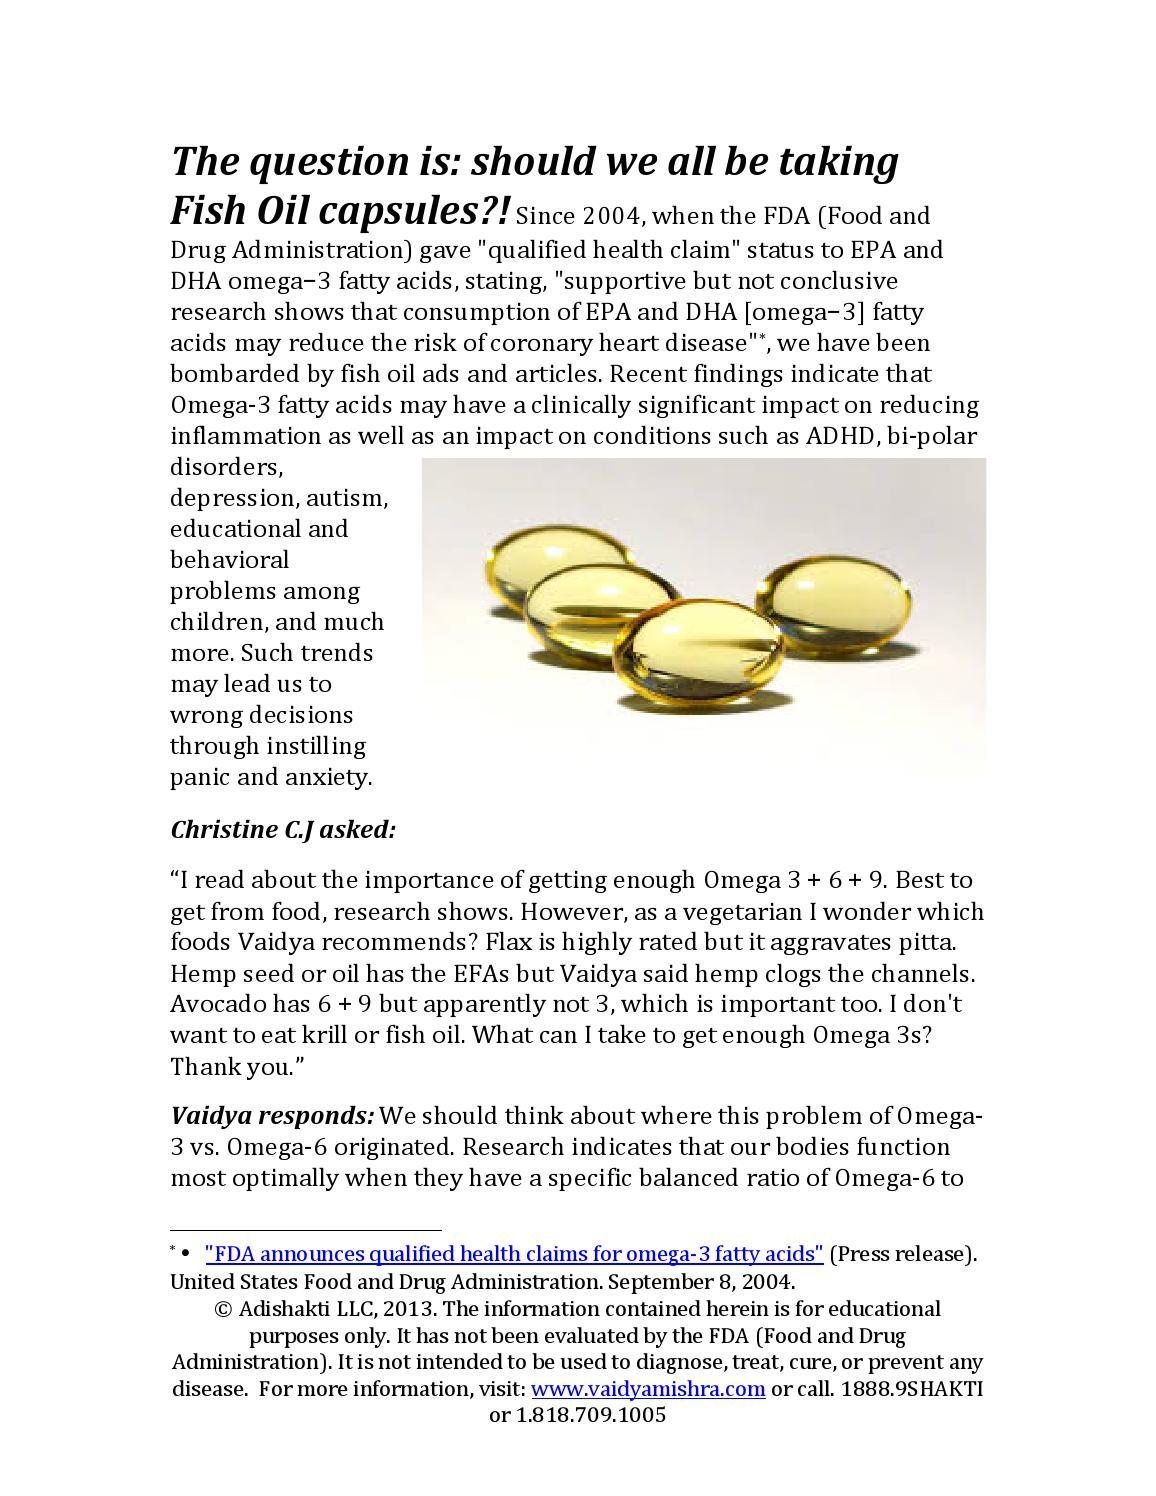 Fish oil april 5 2013 by vaidya mishra issuu for Fish oil depression dosage